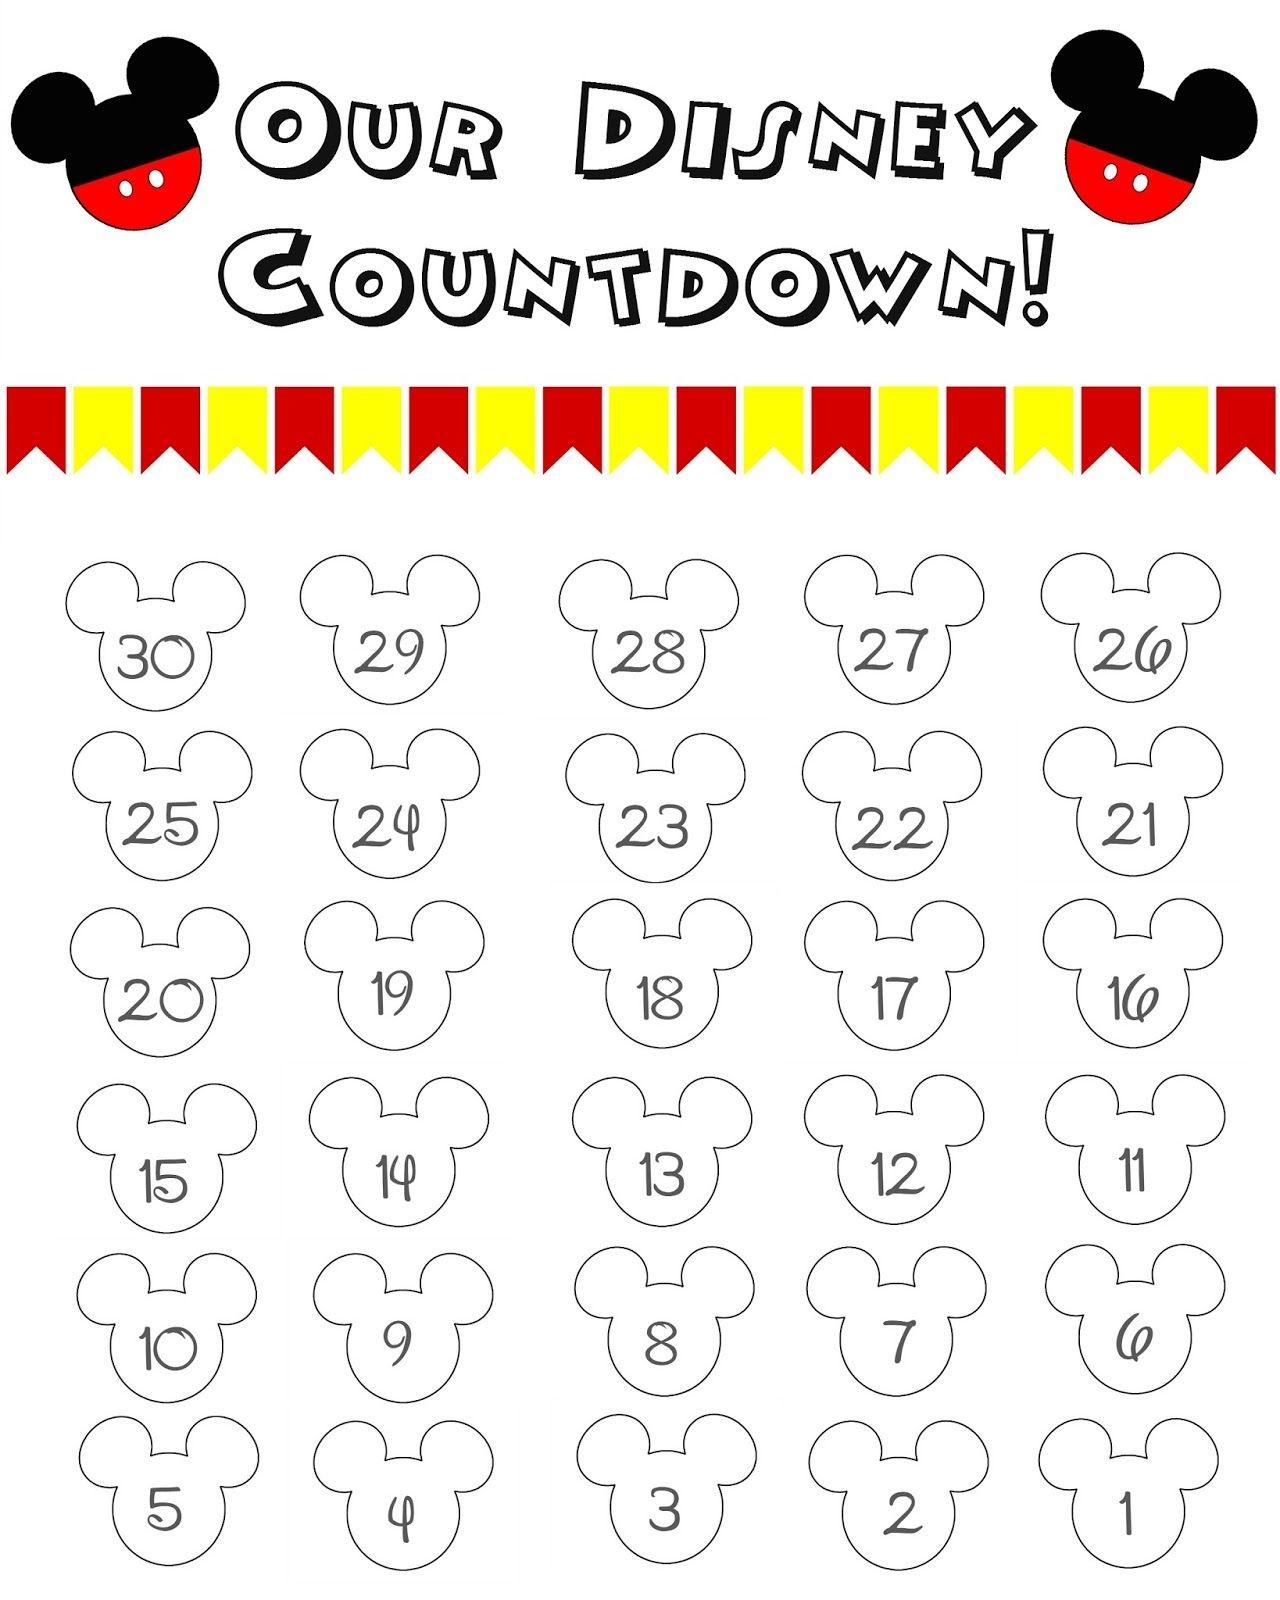 Disney World Countdown Calendar Free Printable Disney  Xjb